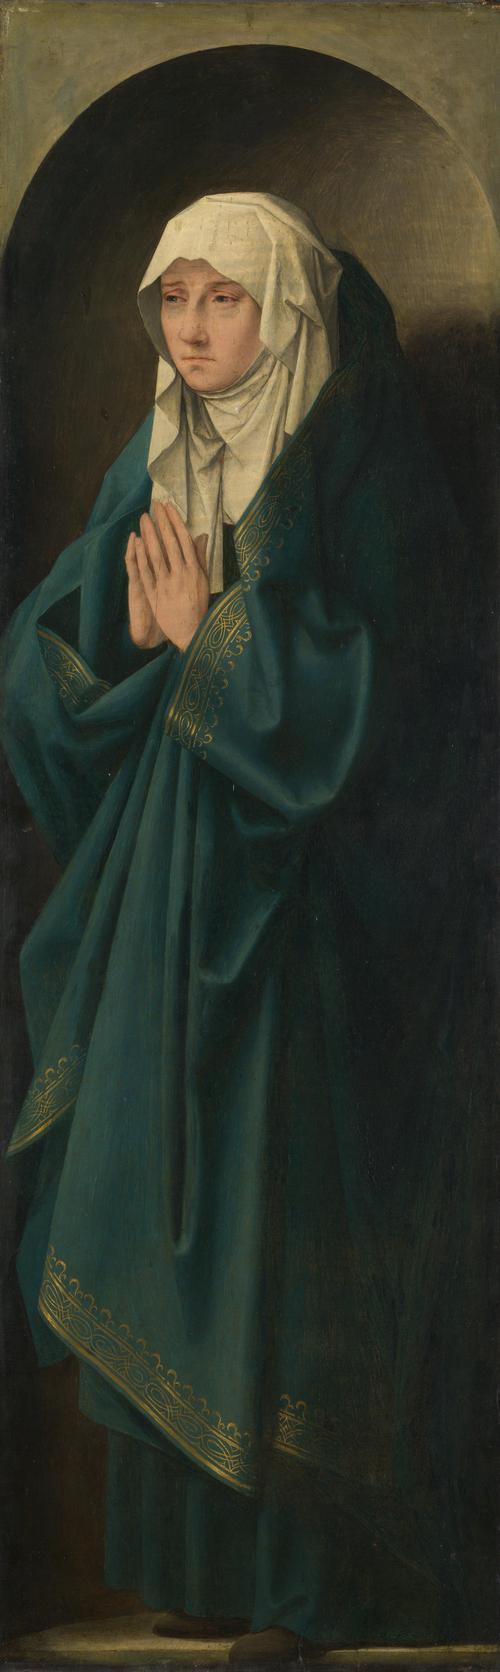 A Female Figure standing in a Niche | Follower of Quinten Massys | oil painting